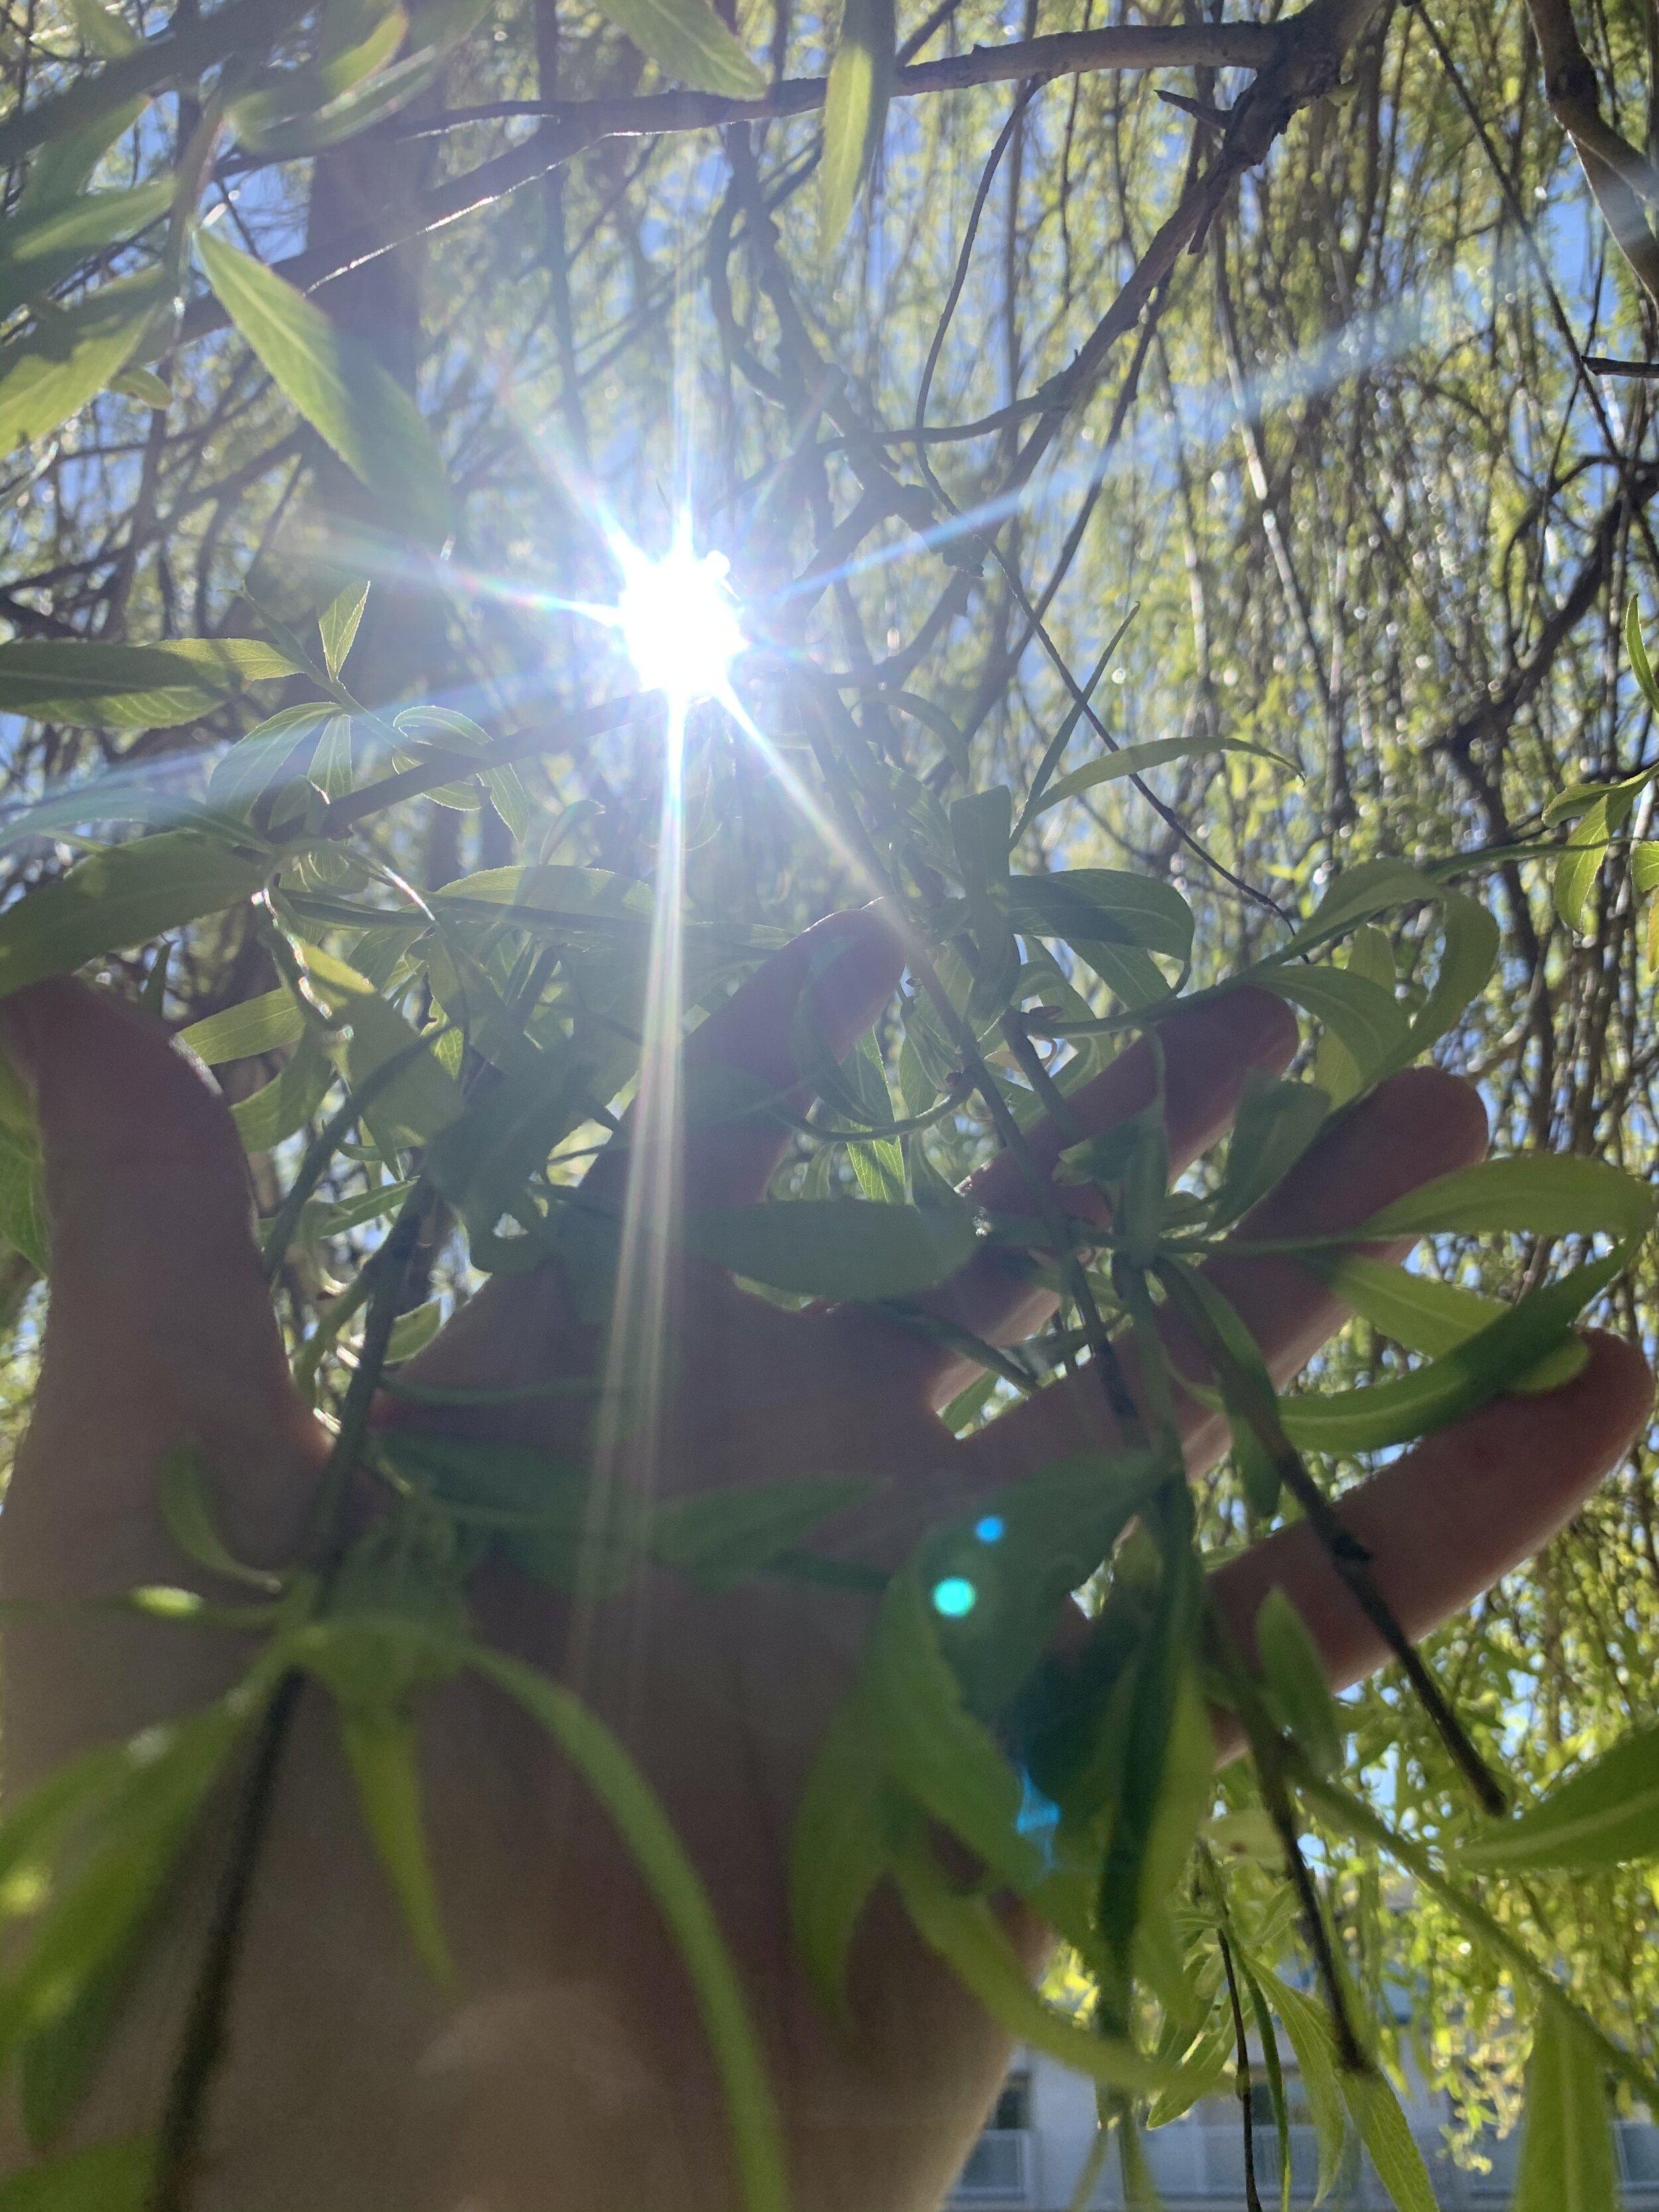 Willow Branch Rooting Hormone Carmelle Lauren Lemaistre R Ac